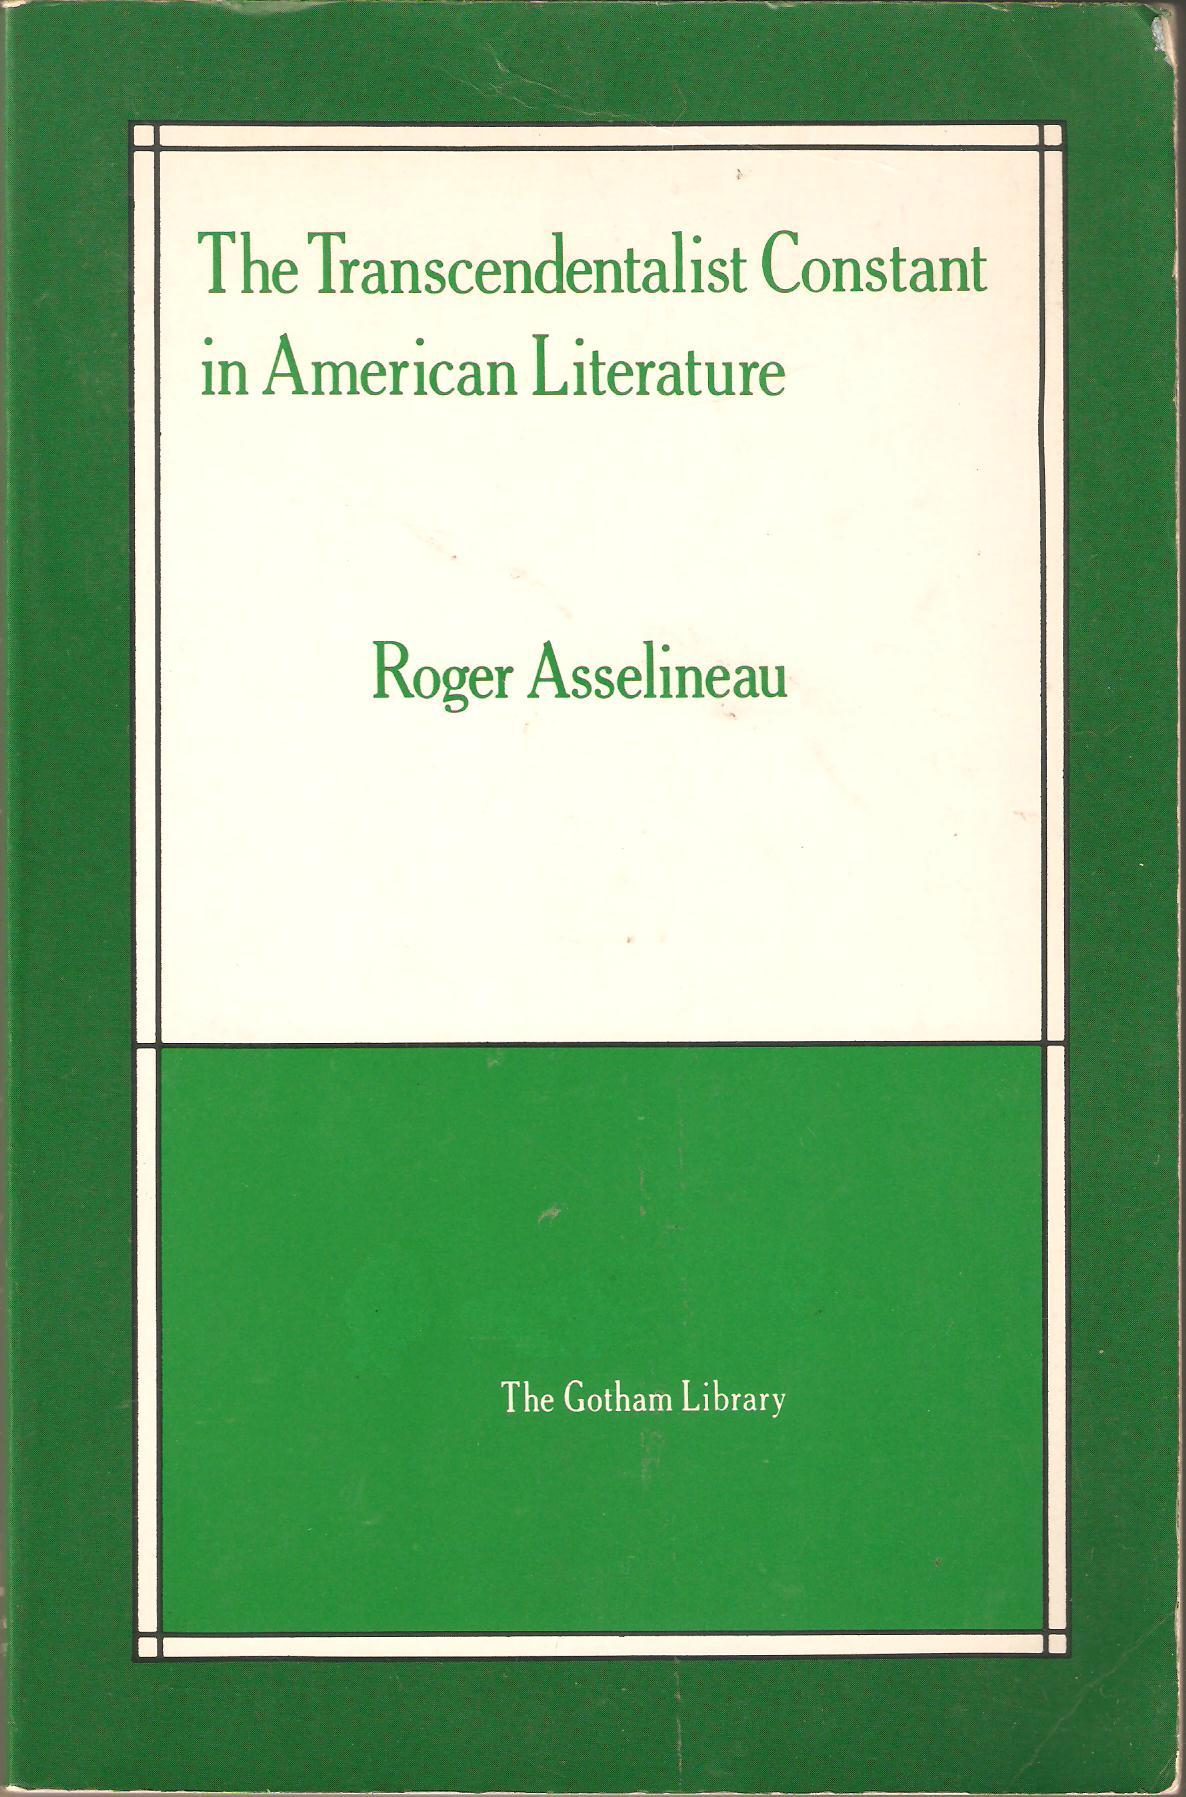 The Transcendentalist Constant in American Literature